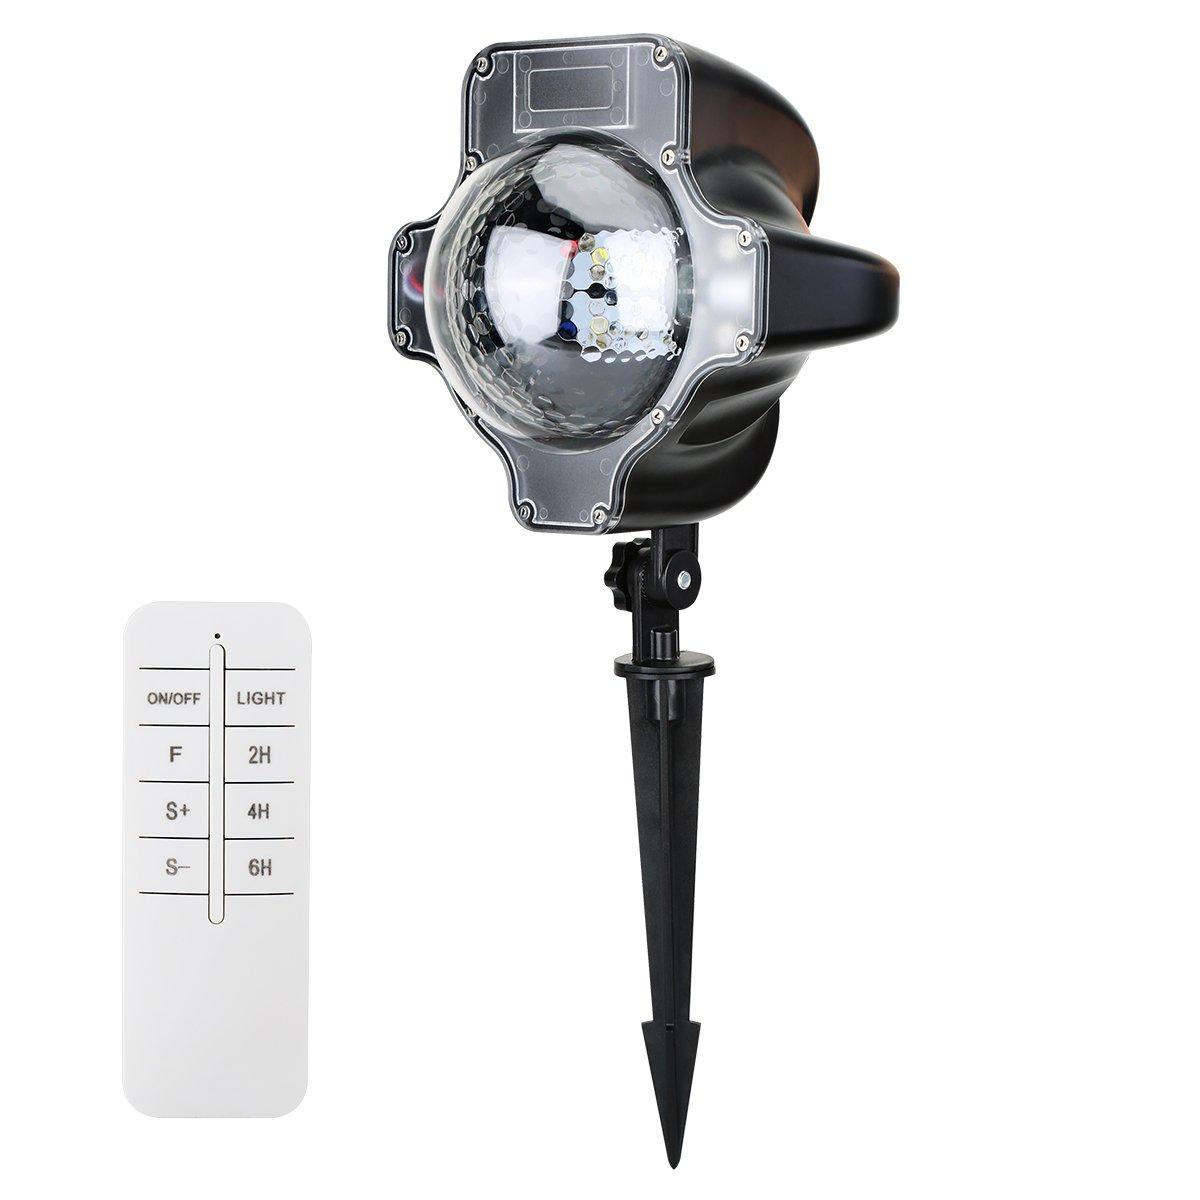 ALWOA LED Snowfall Light, Rotatable Snowflake Projector Lamp Specially Designed Waterproof Landscape Decoration Li